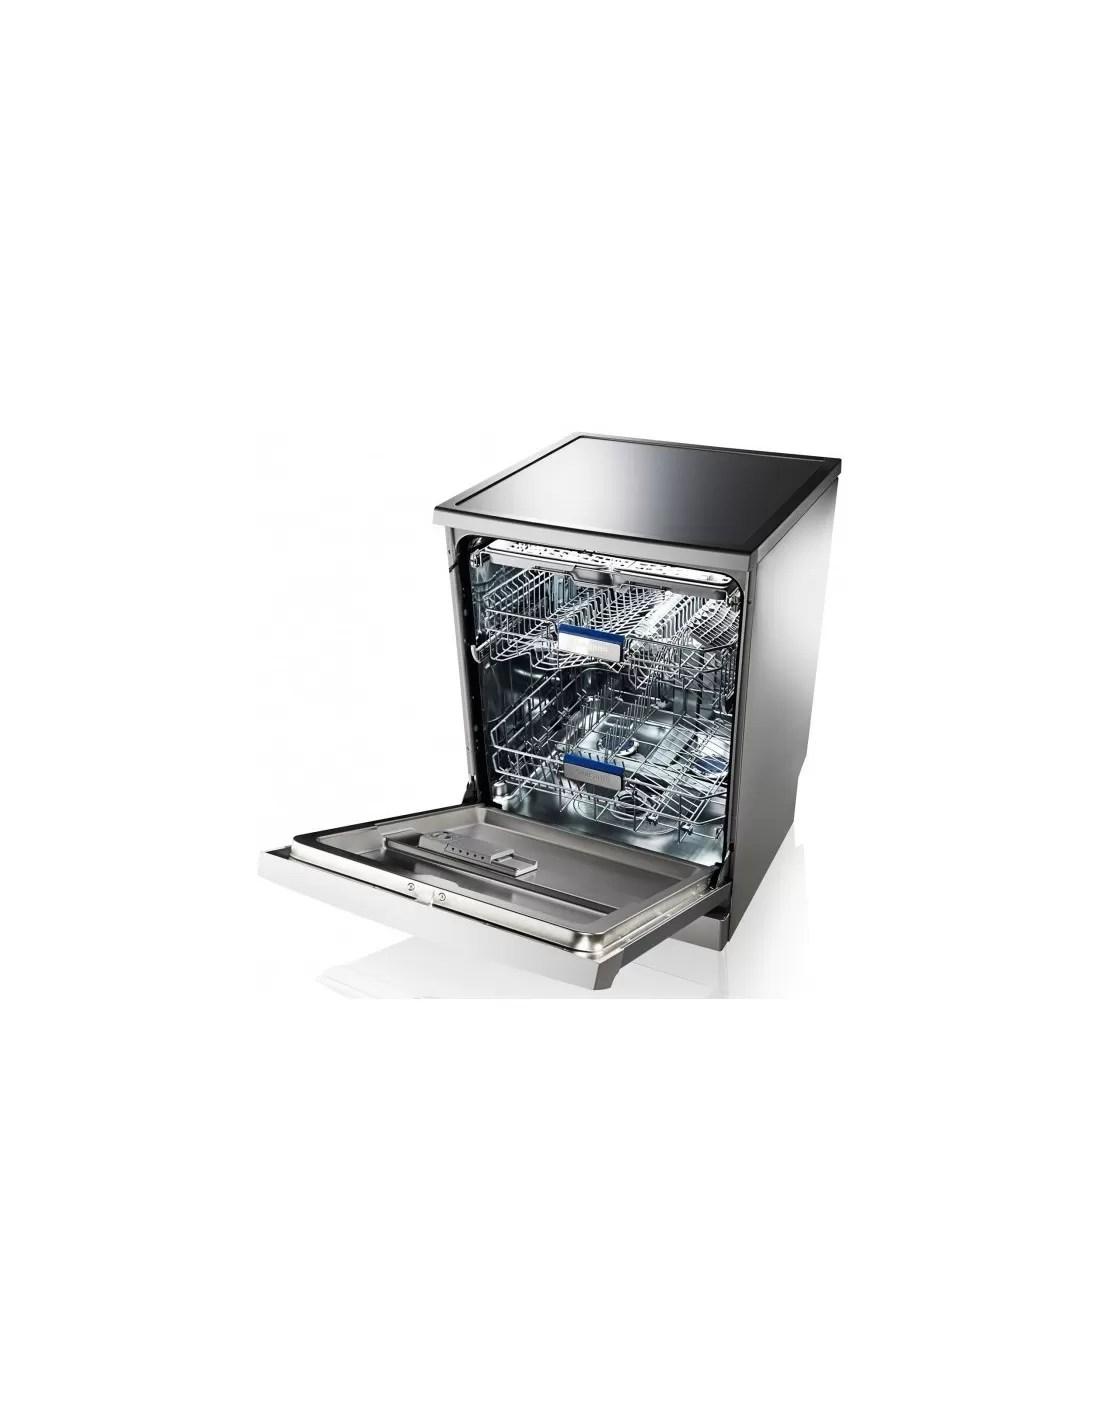 lave vaisselle samsung 13 couverts inox dw60h5050fs